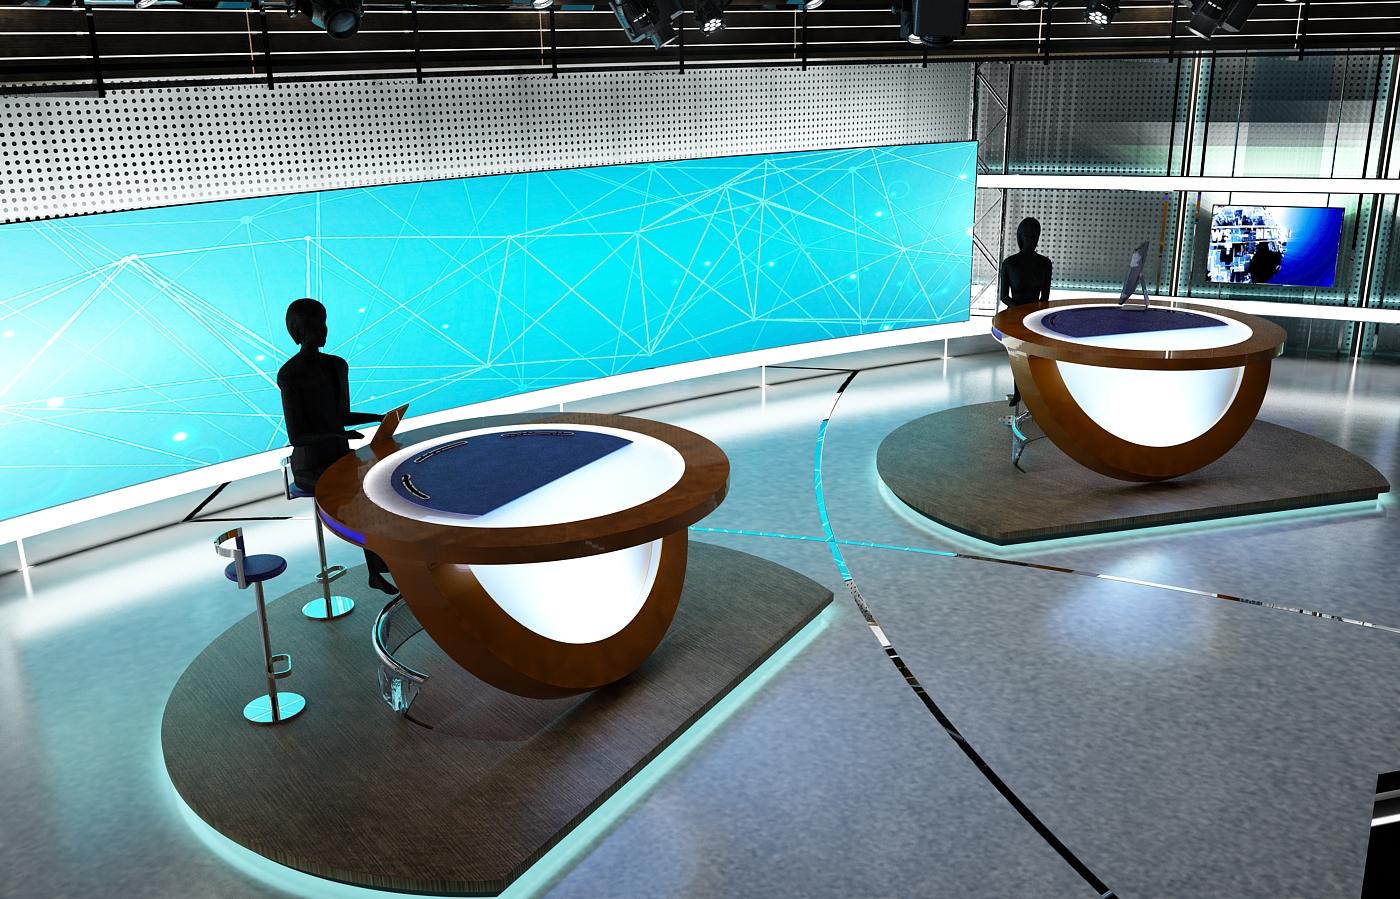 виртуал телевизийн студи цуглуулга vol 6 3d загвар max dxf dwg fbx obj 223407